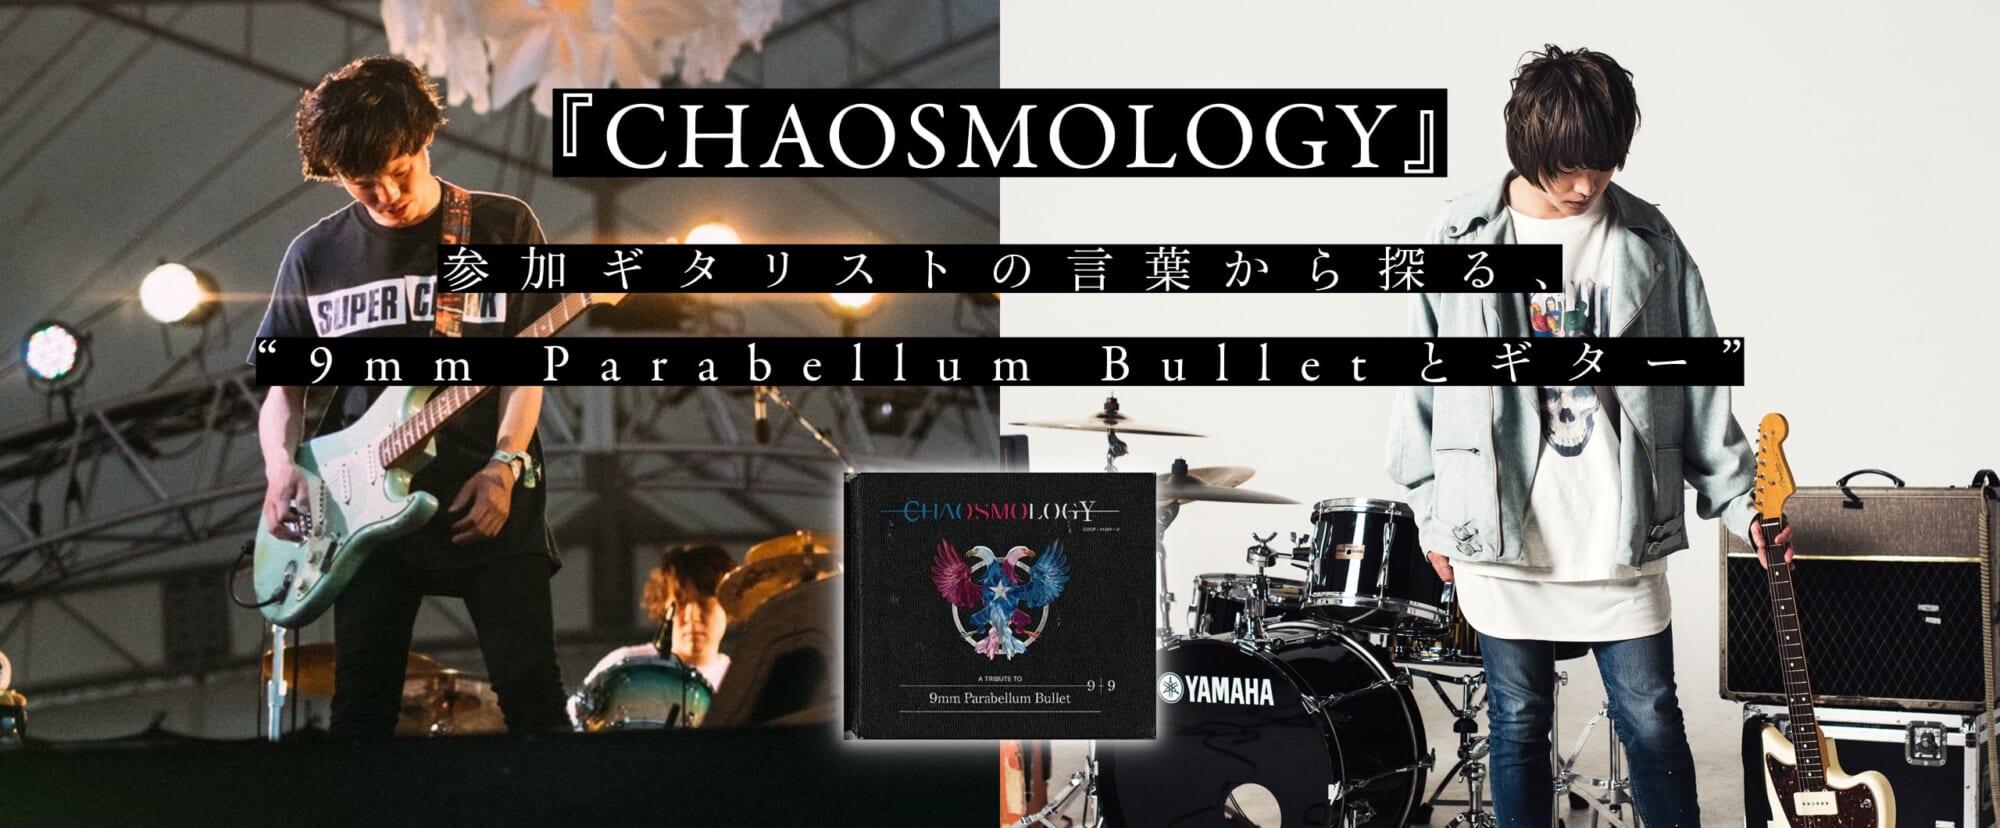 cinema staff『CHAOSMOLOGY』インタビュー